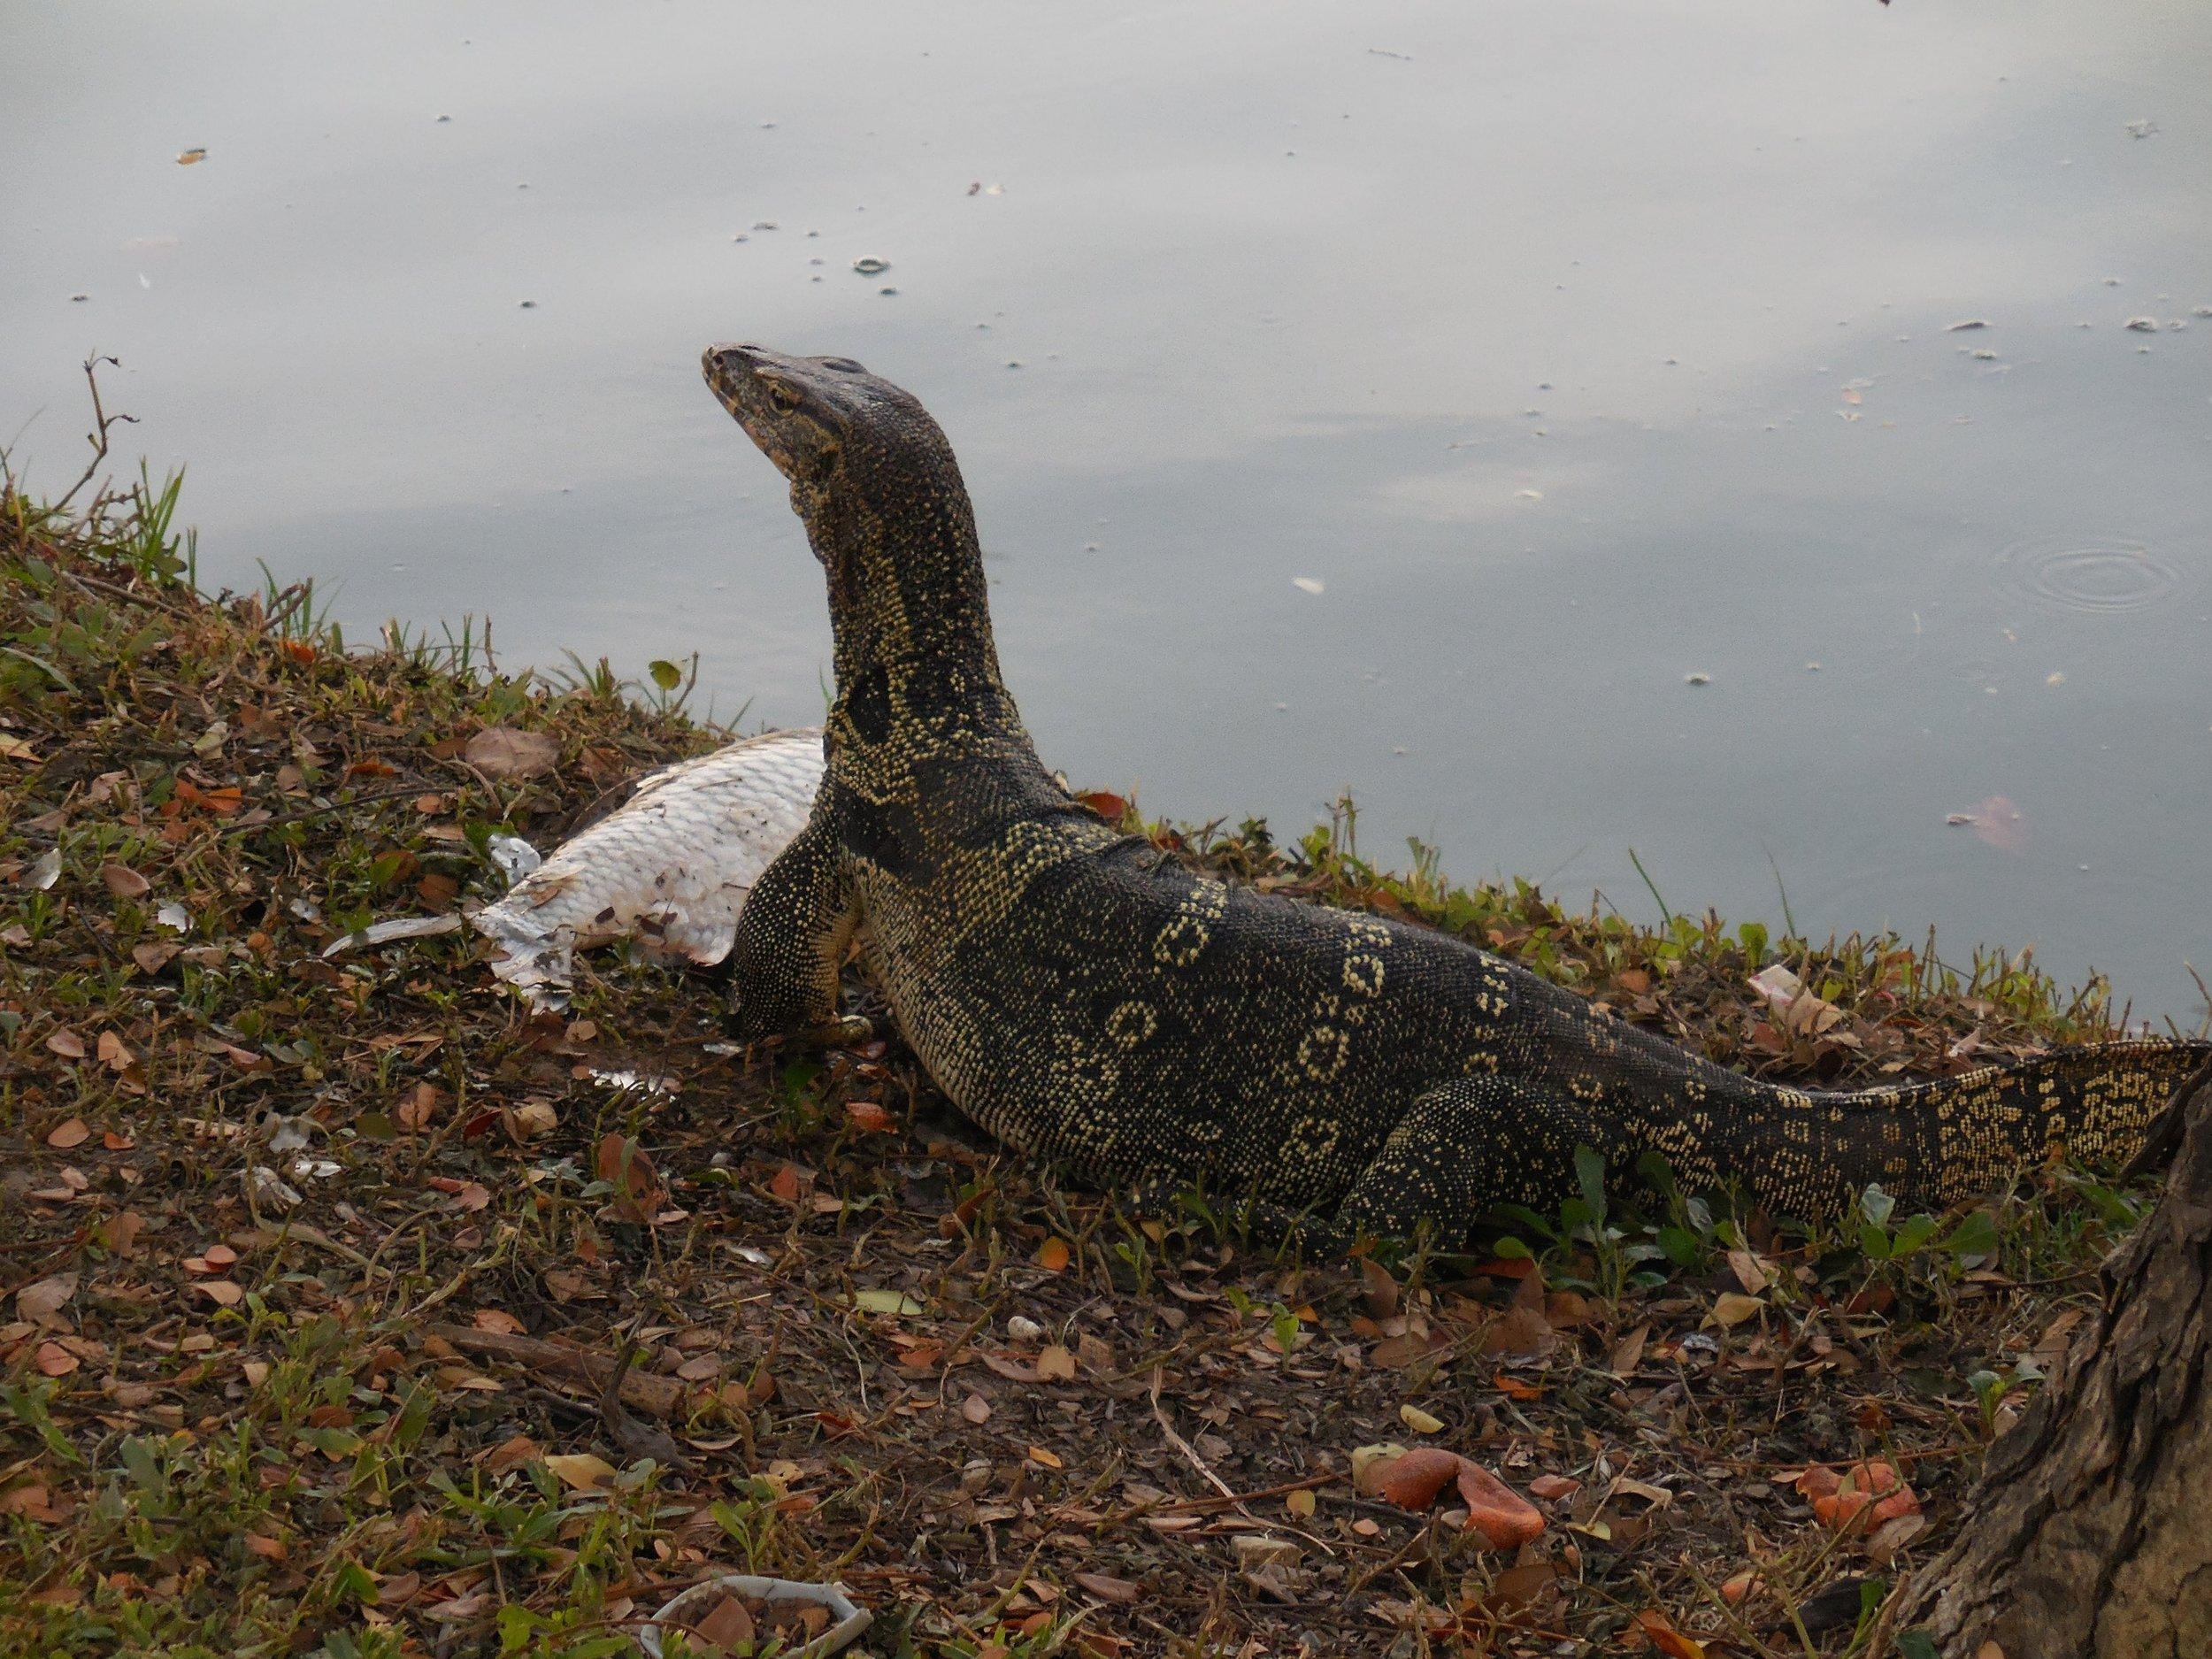 Bangkok - Lizard